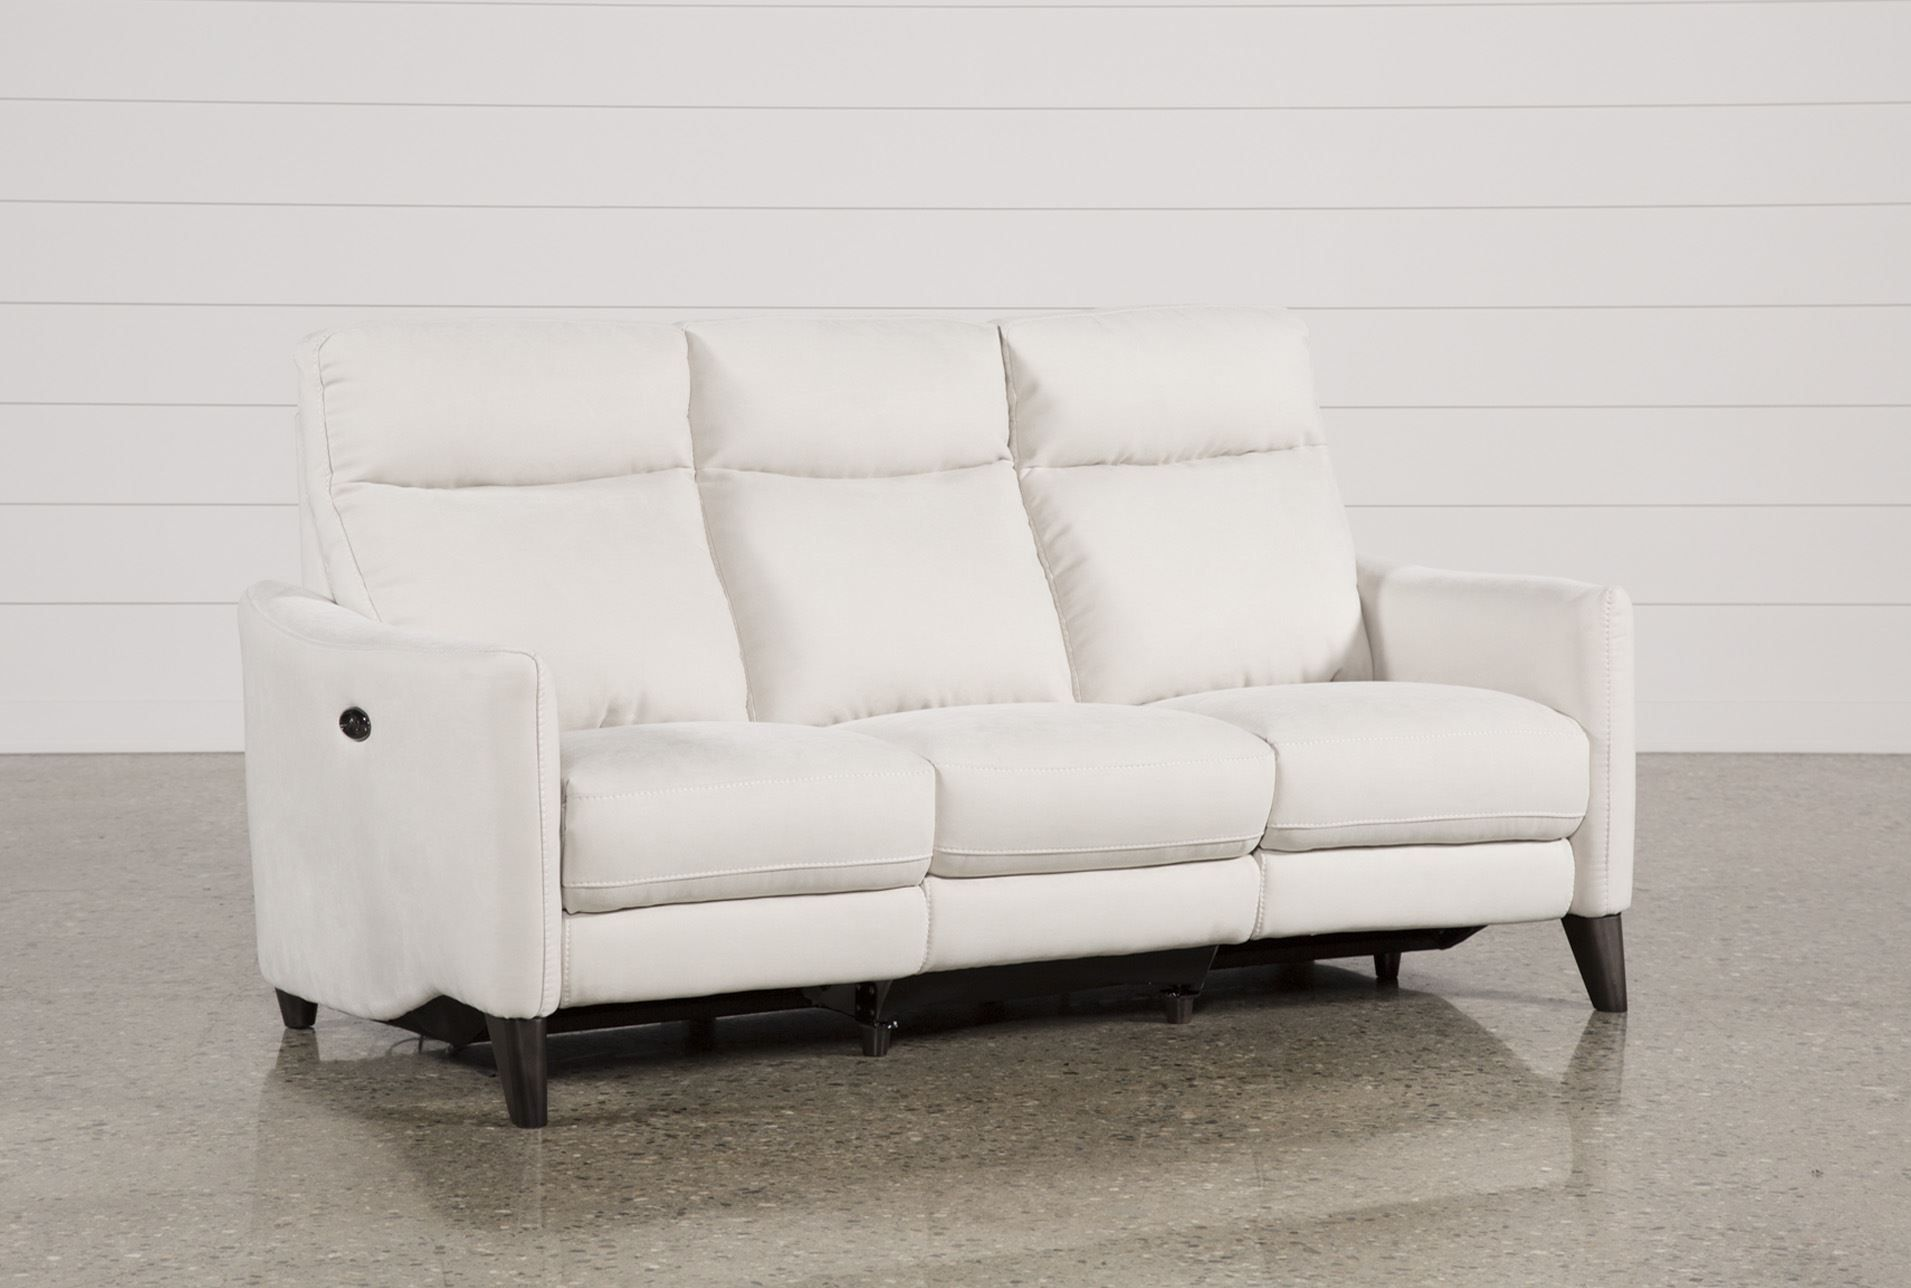 Melina Bisque Power Reclining Sofa W/Usb & Melina Bisque Power Reclining Sofa W/Usb | Reclining sofa Living ... islam-shia.org